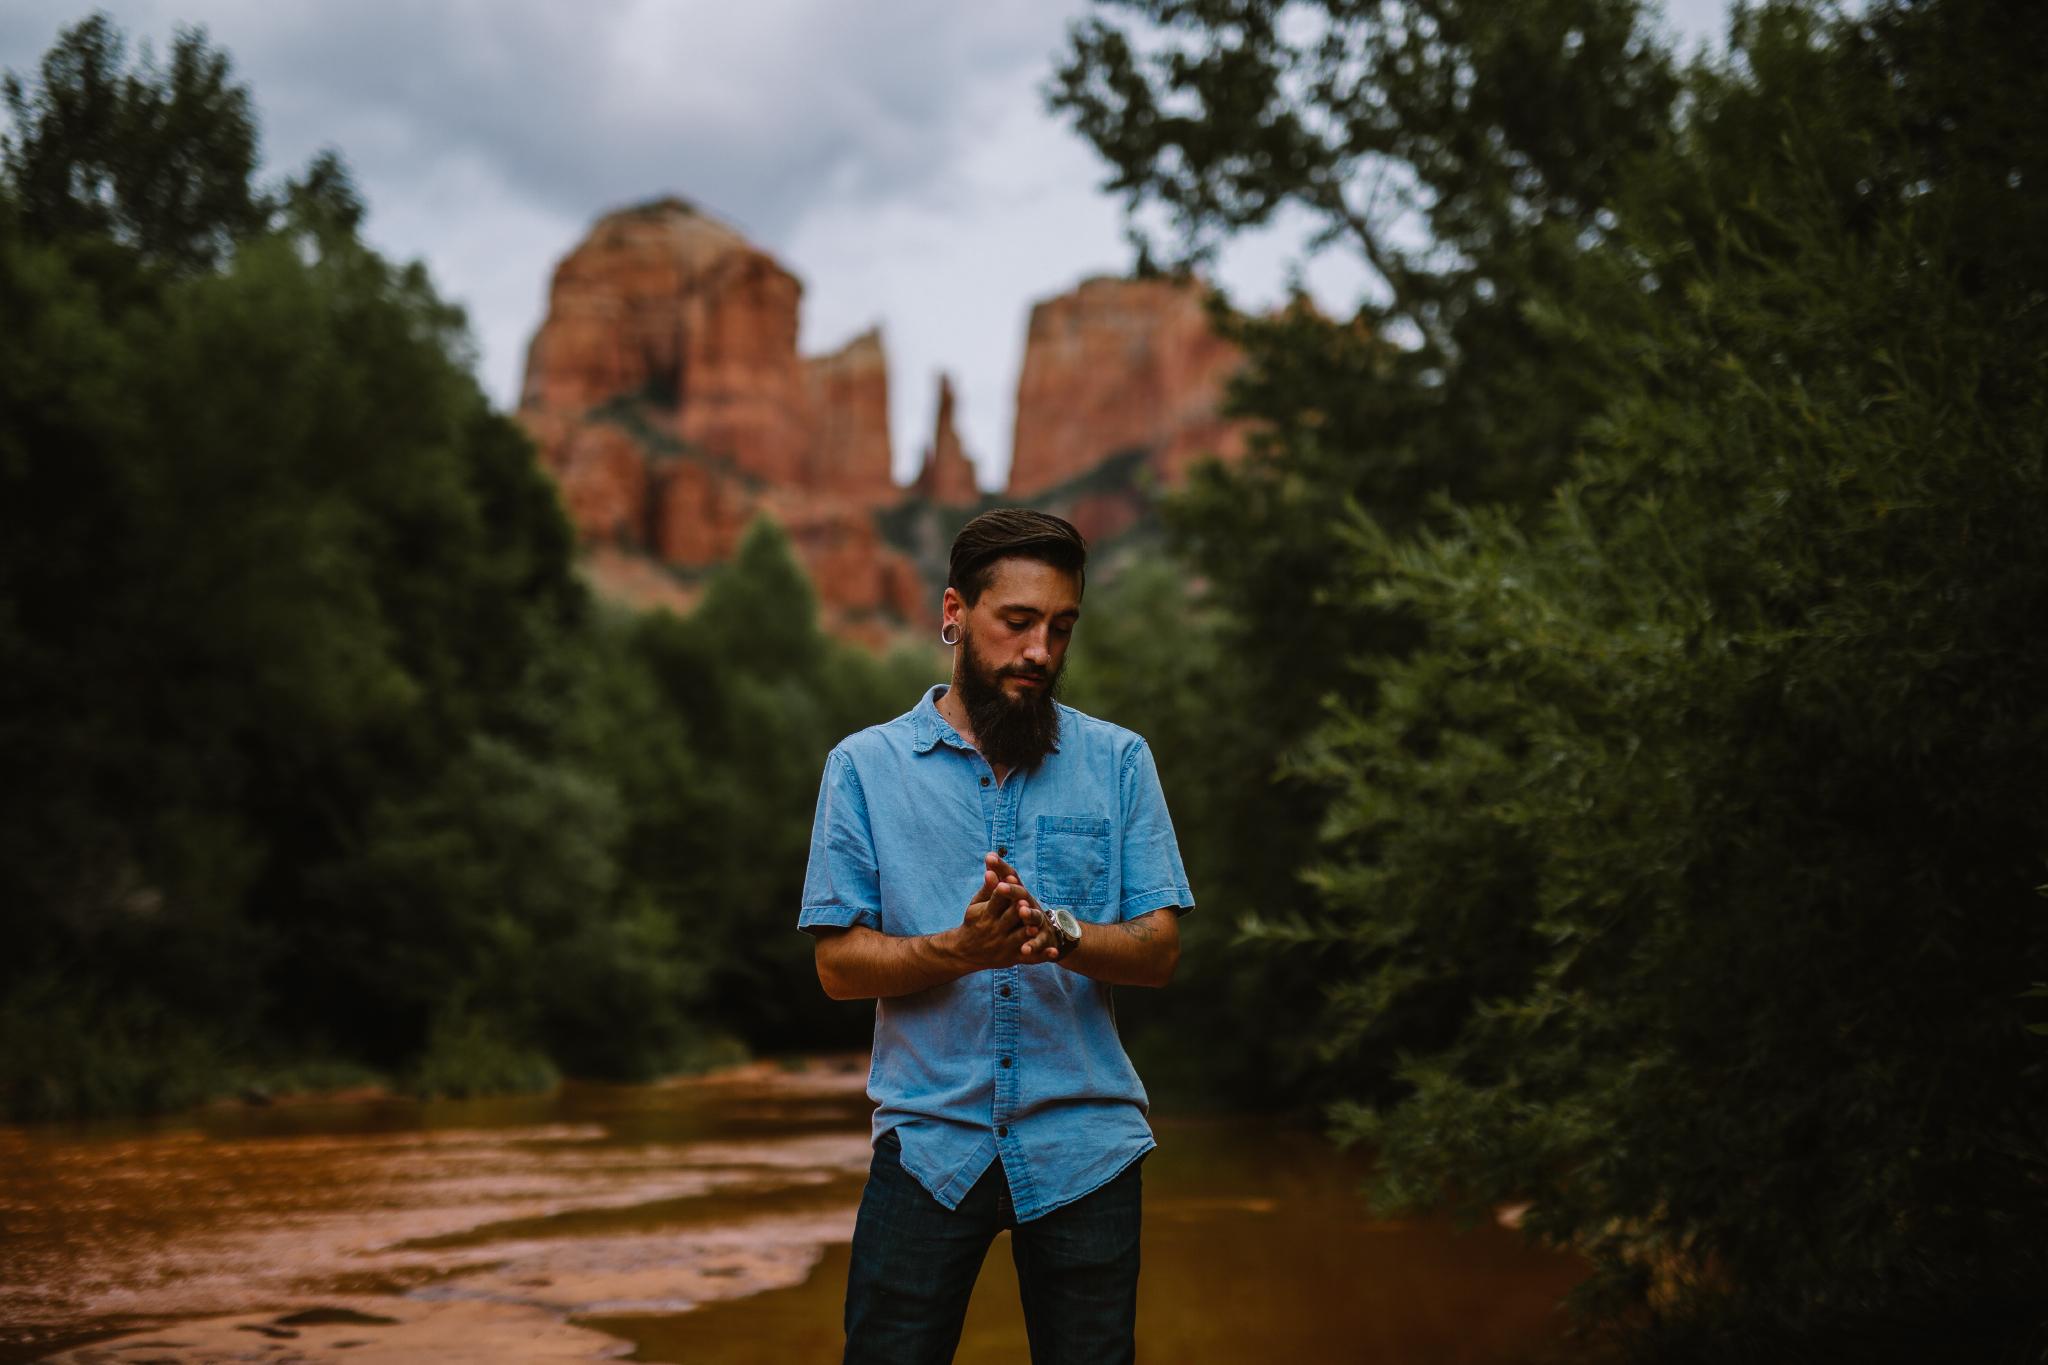 san diego wedding   photographer | bearded man in blue rubbing hands